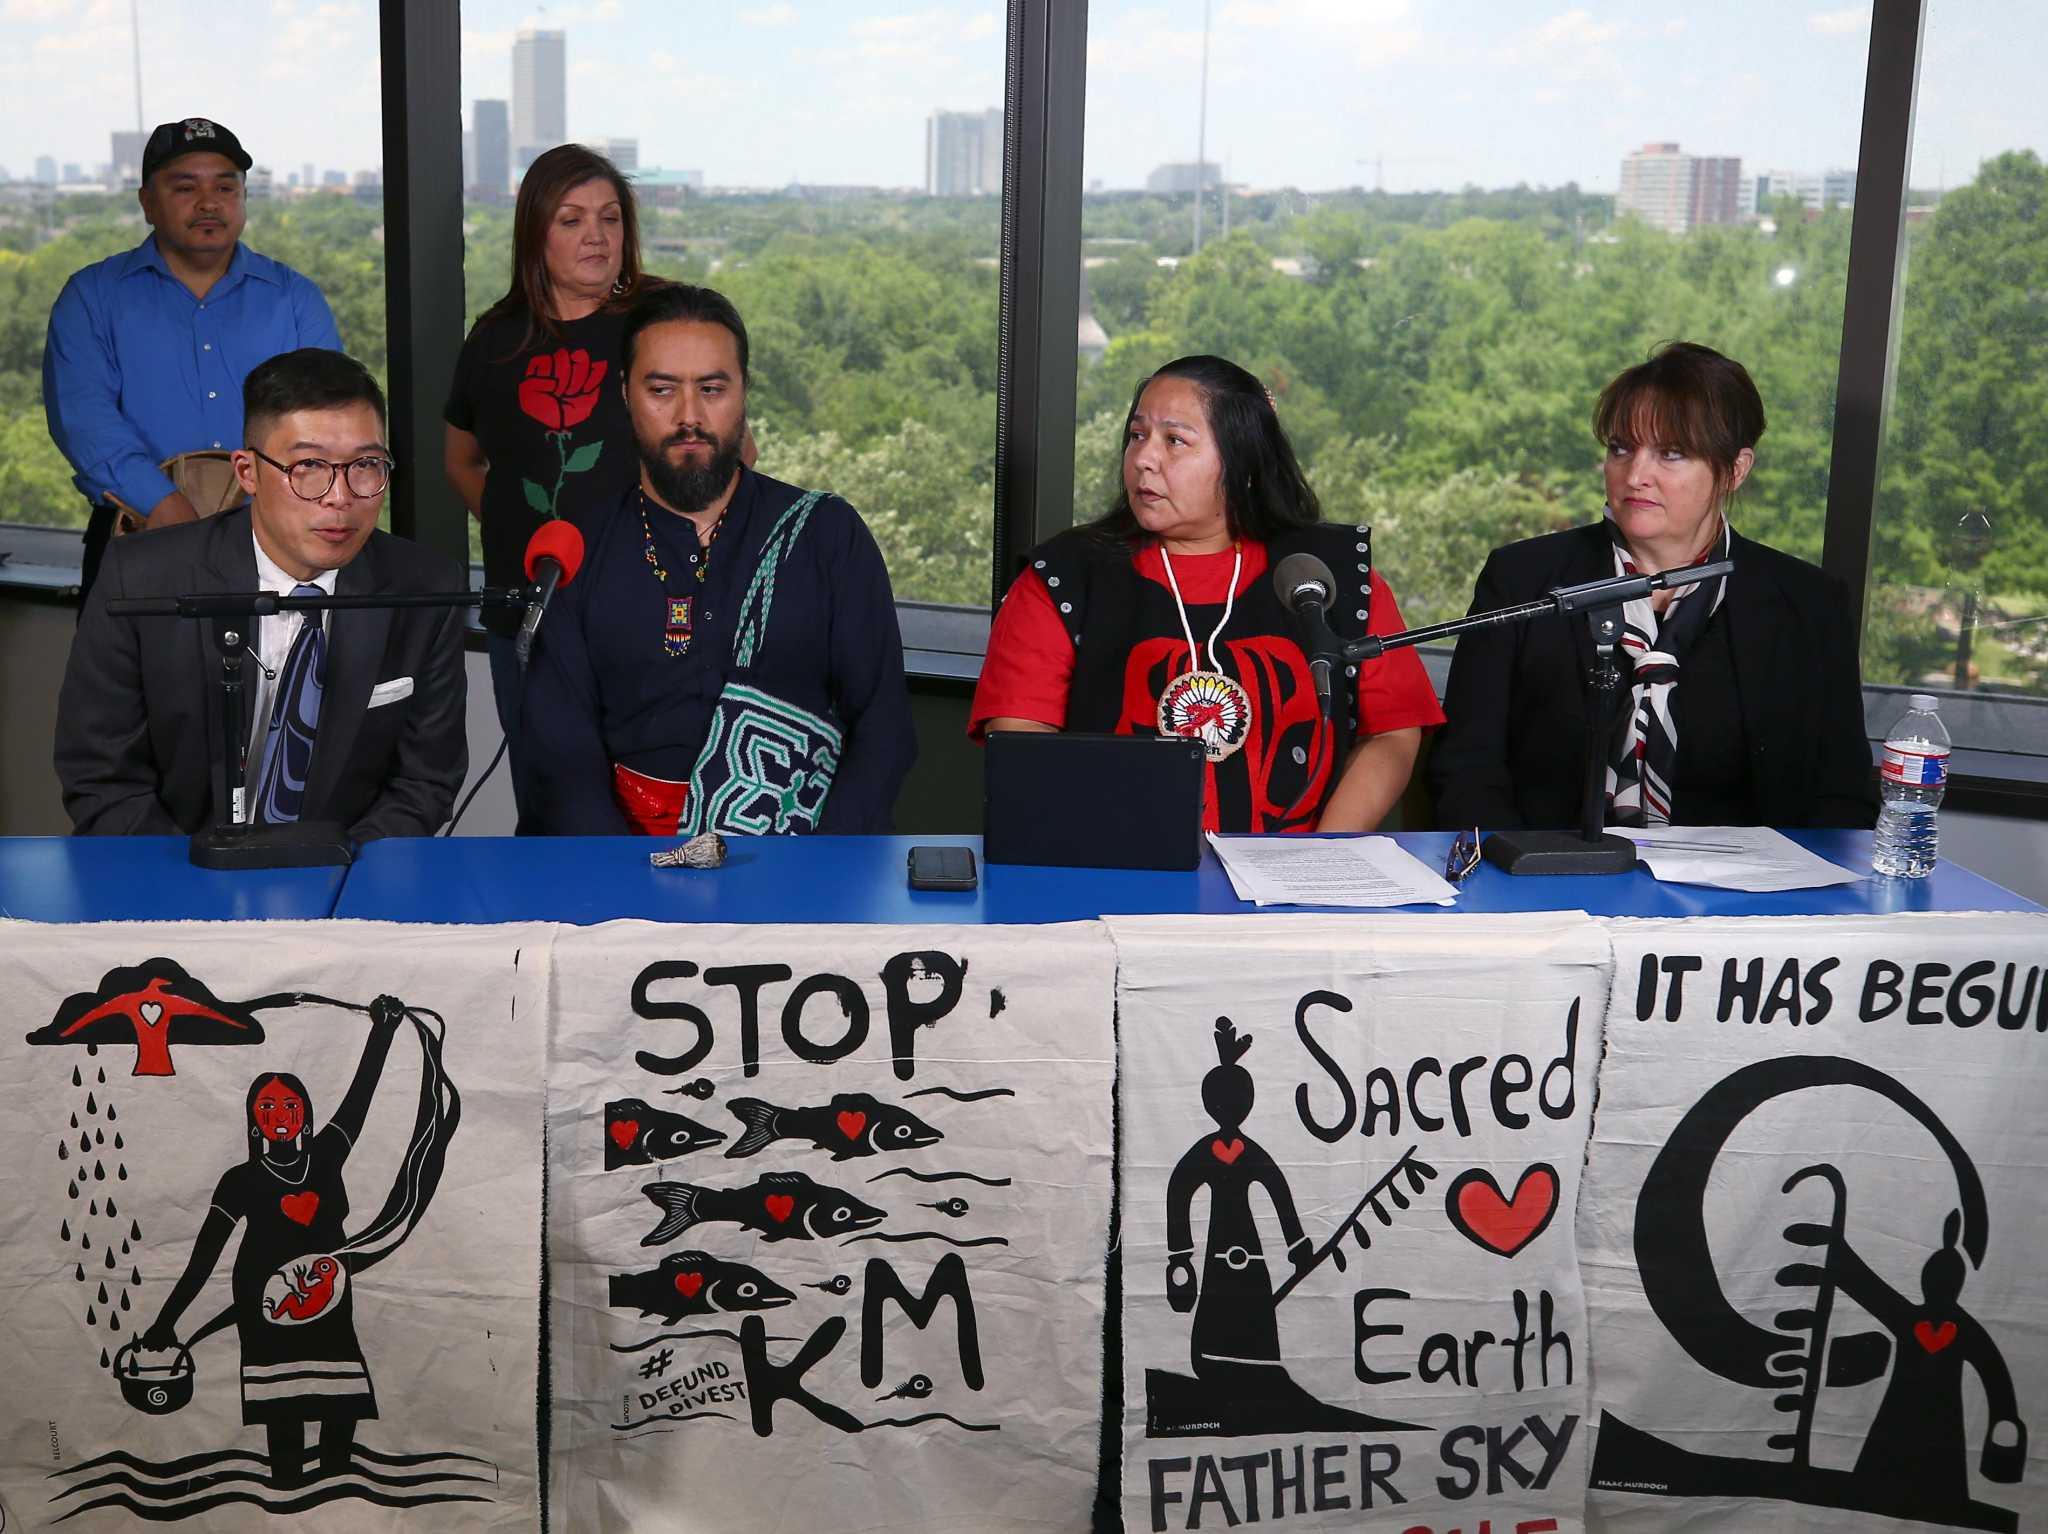 Opinion: State-based insurer should drop tar sands pipeline